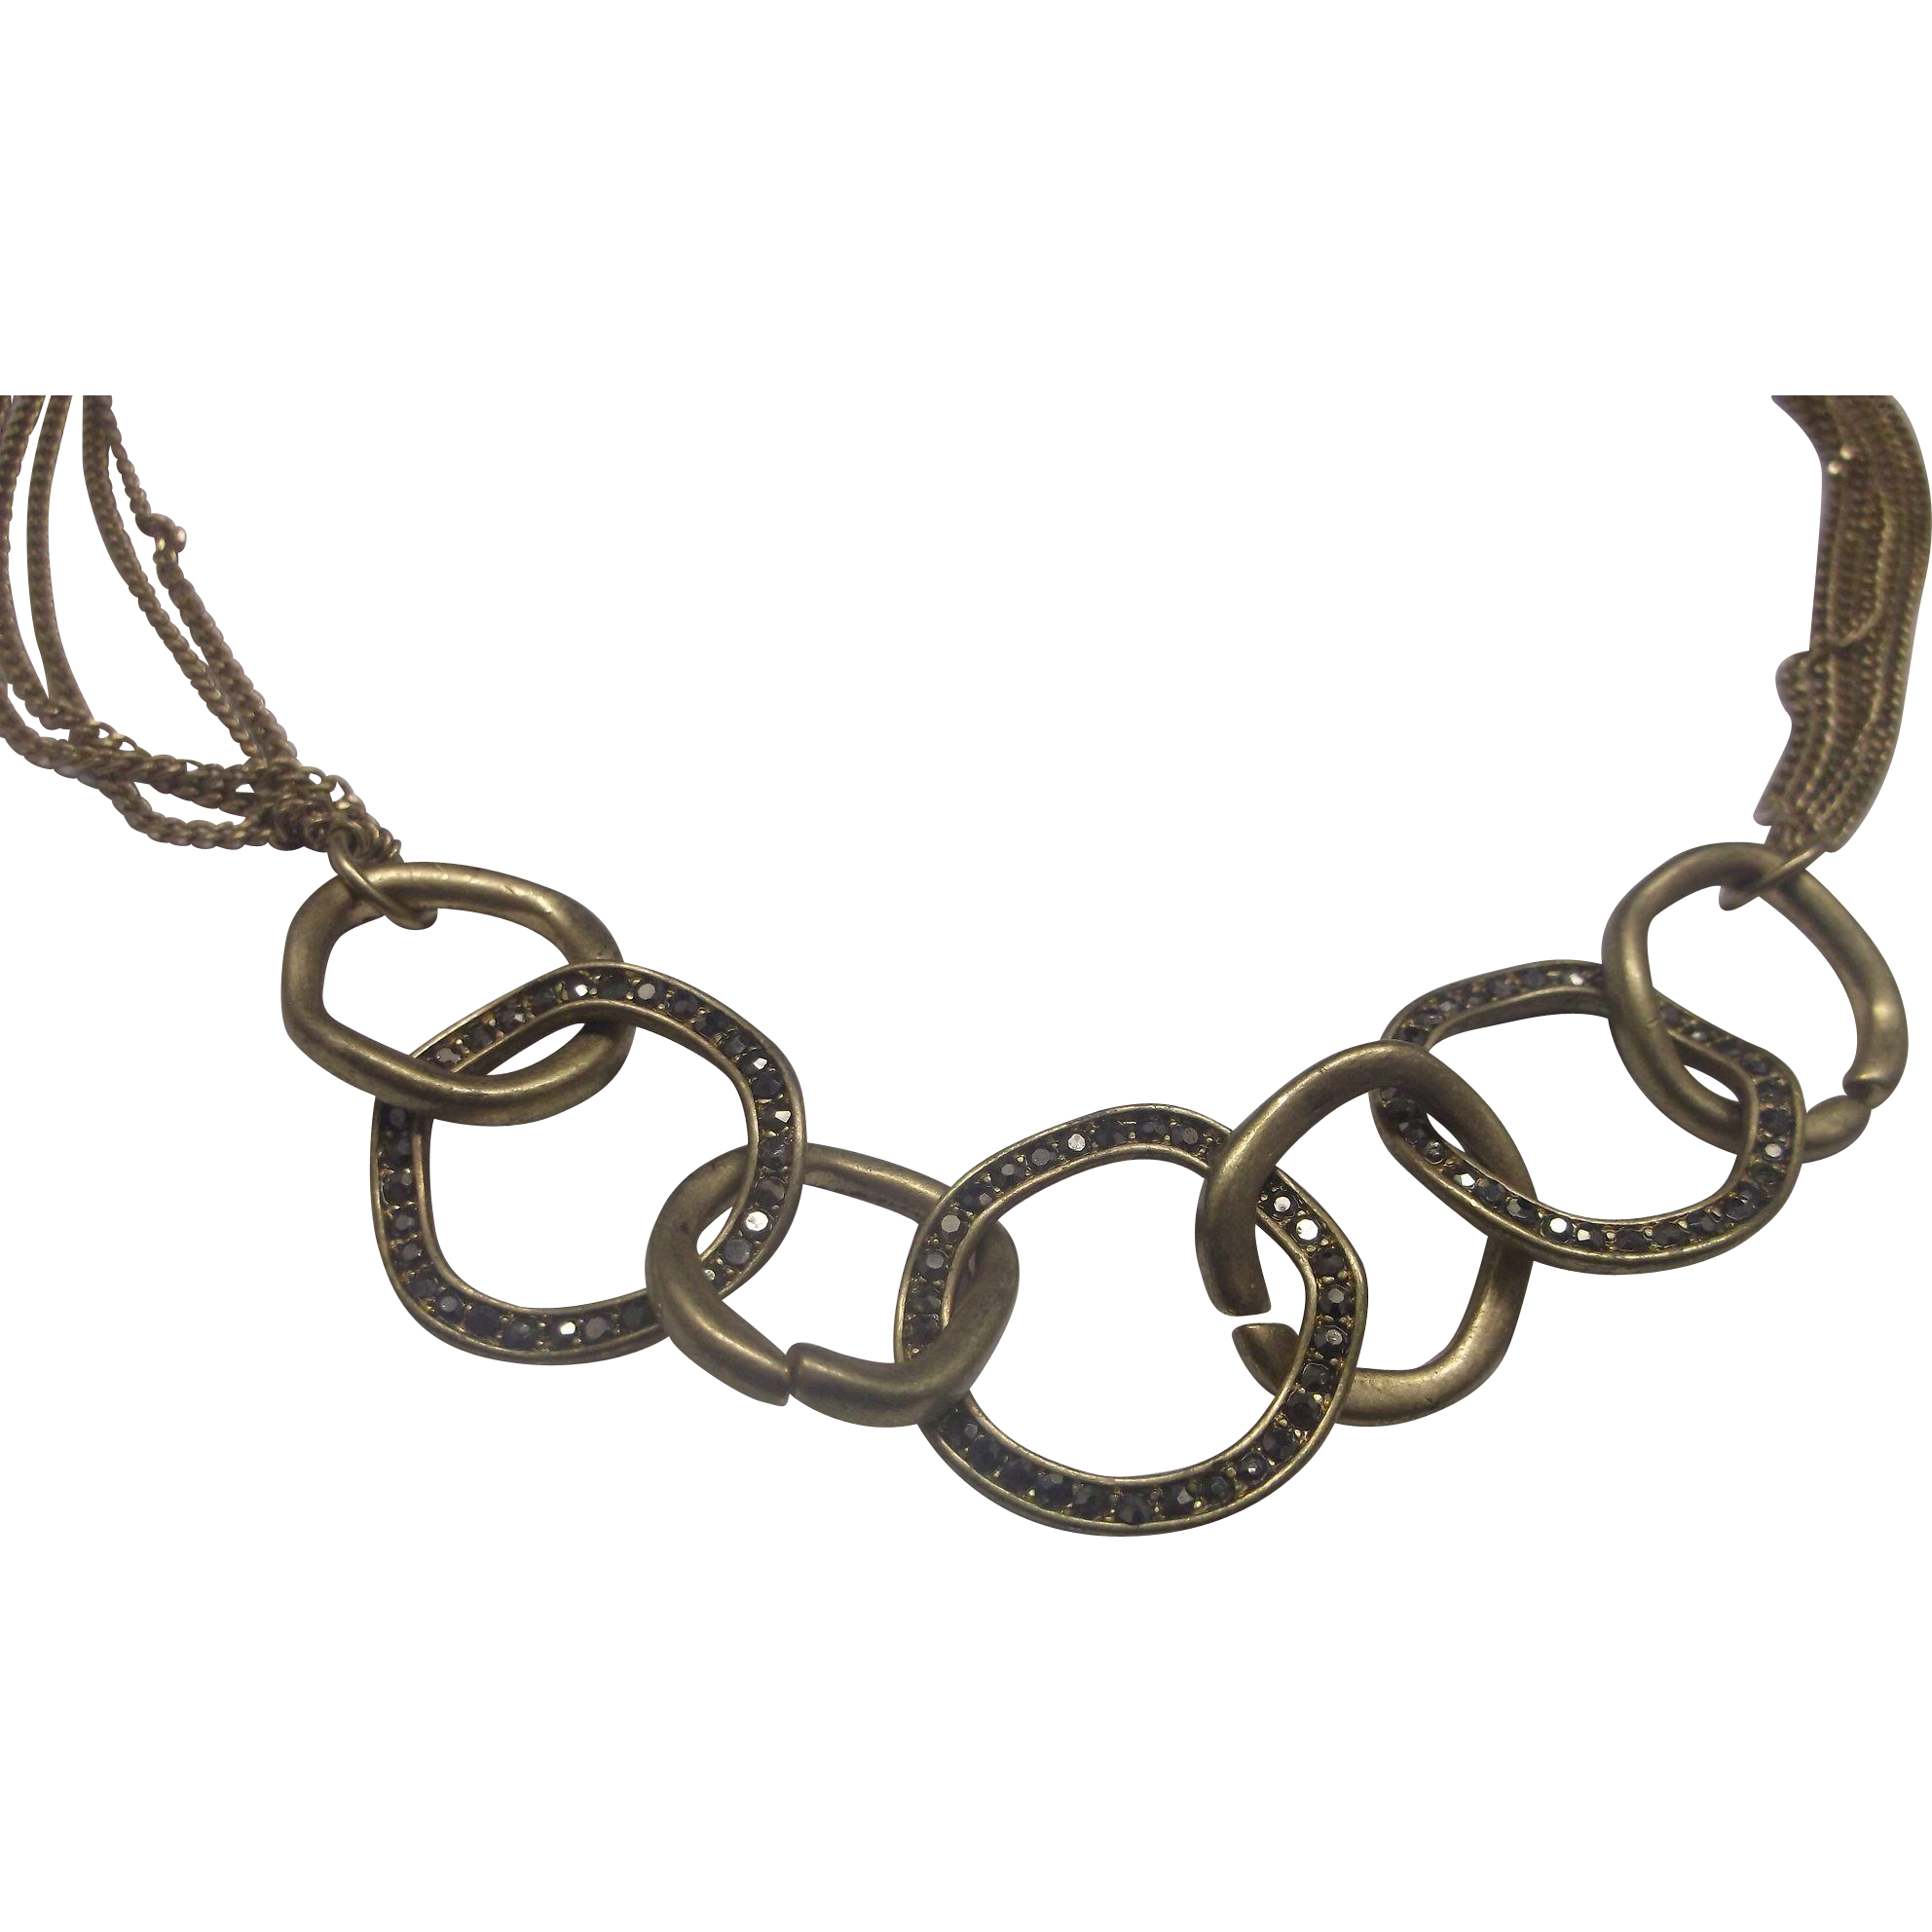 Chocolate Rhinestones Burnished Gold Tone Interlocking Rings Multiple Chains Necklace Signed